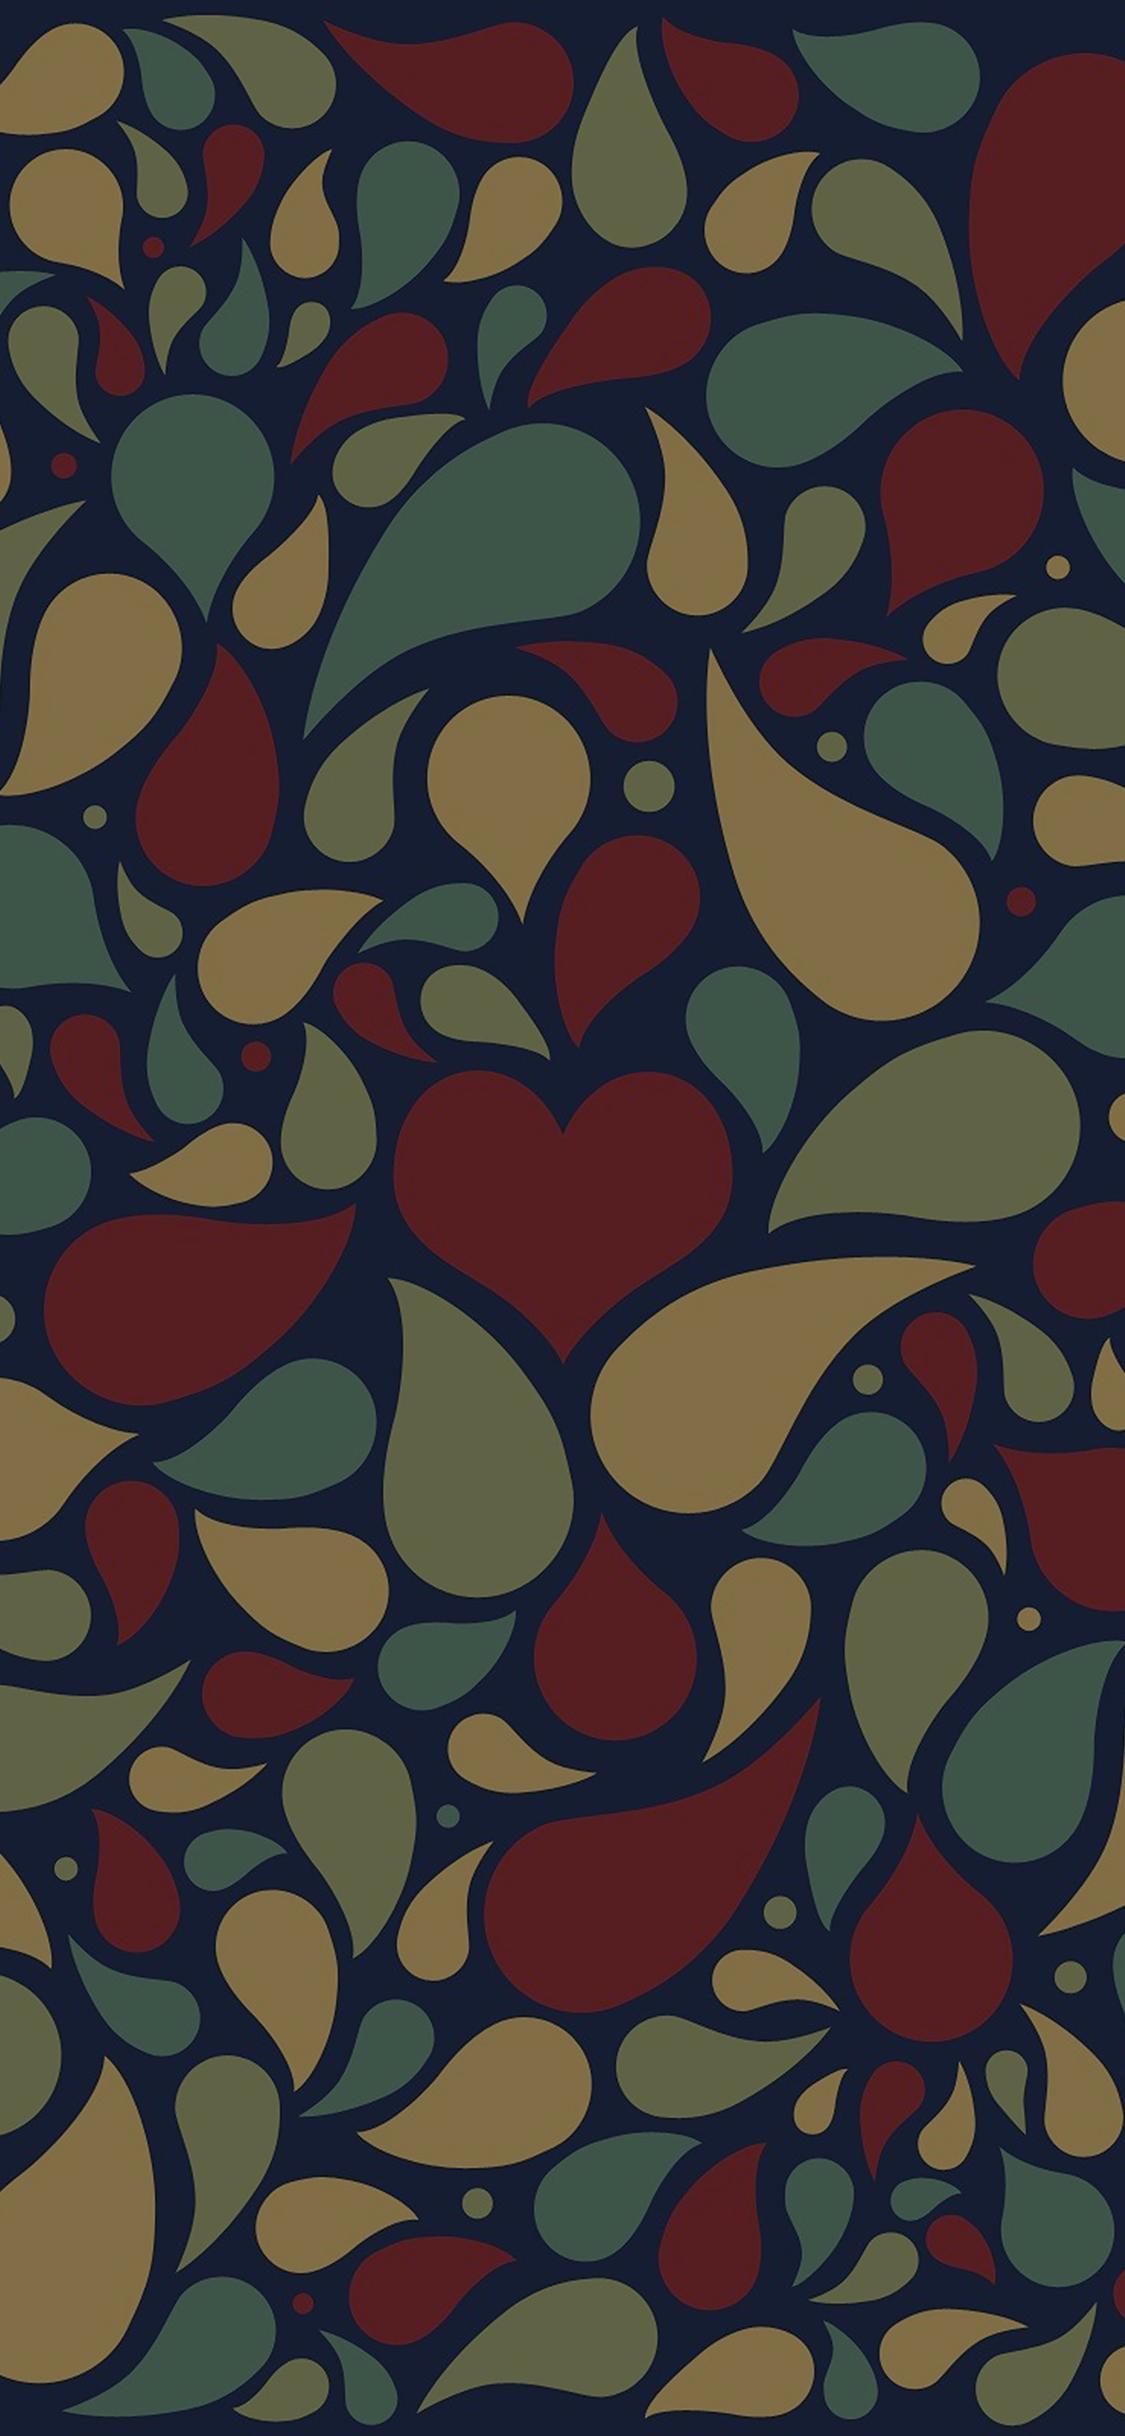 iPhoneXpapers.com-Apple-iPhone-wallpaper-ve21-drop-water-love-pattern-art-digital